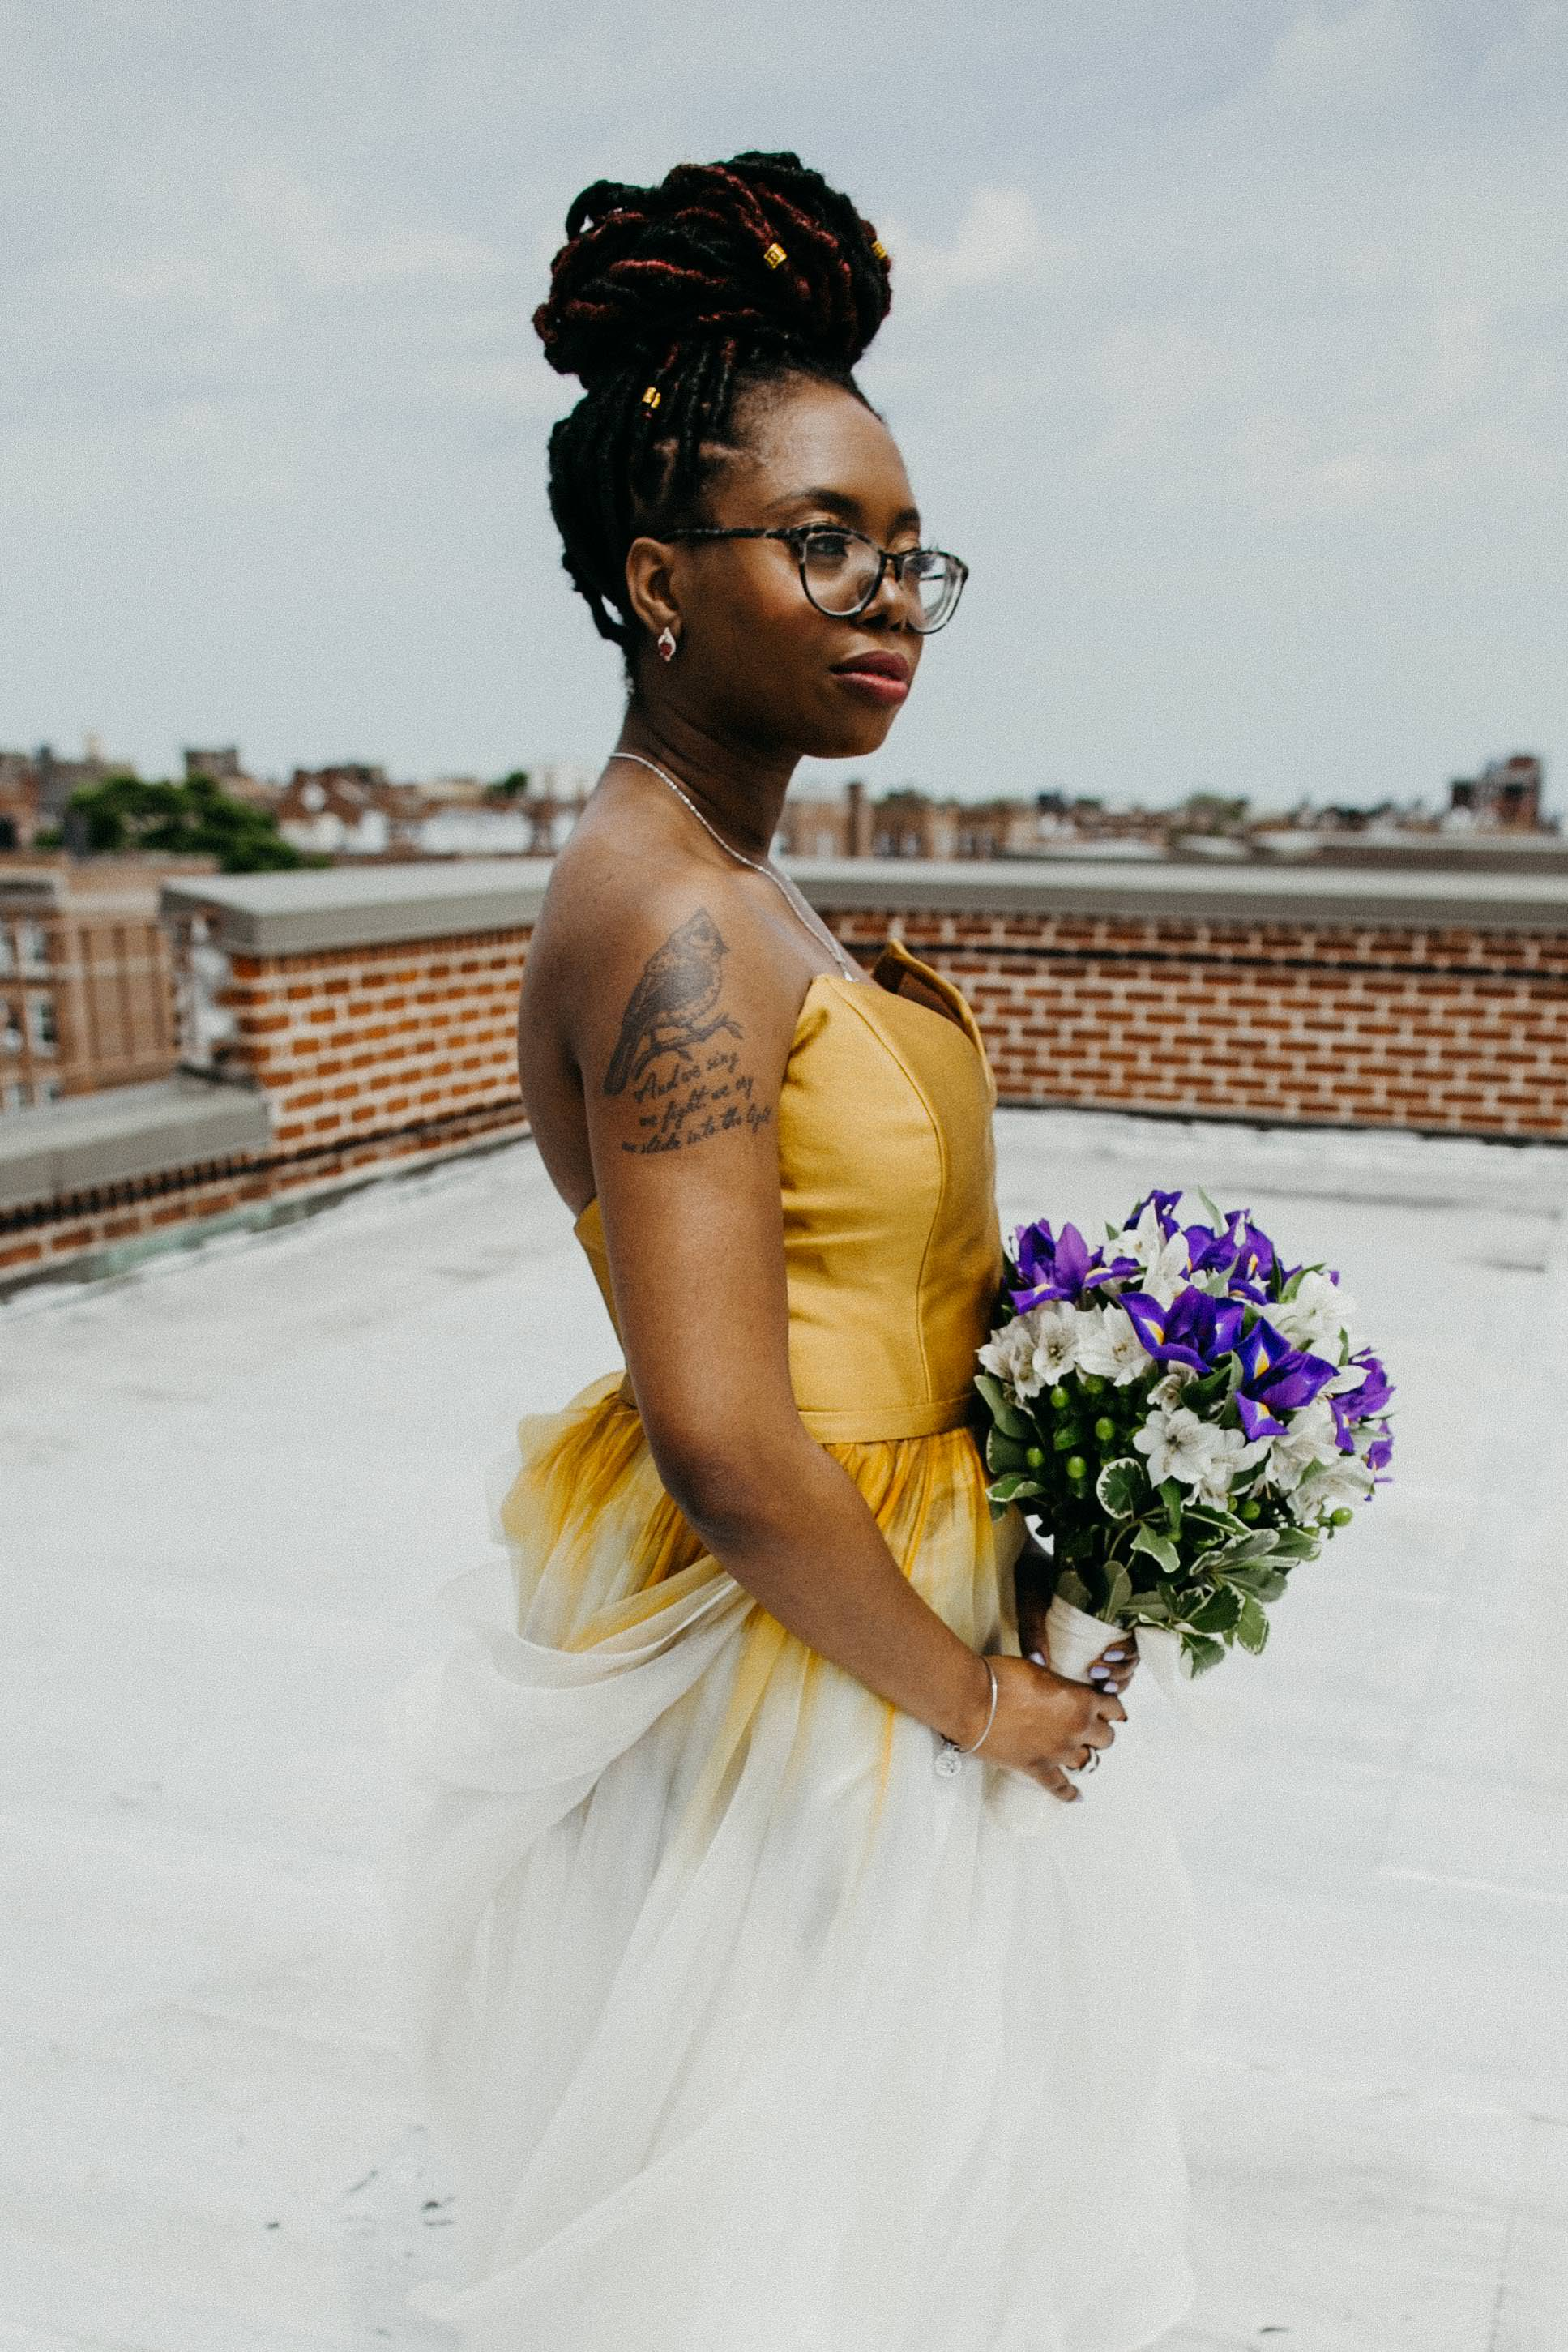 Sevlynn-Photography-Wedding-LIC-Landing-Maiella-NYC-12.jpg